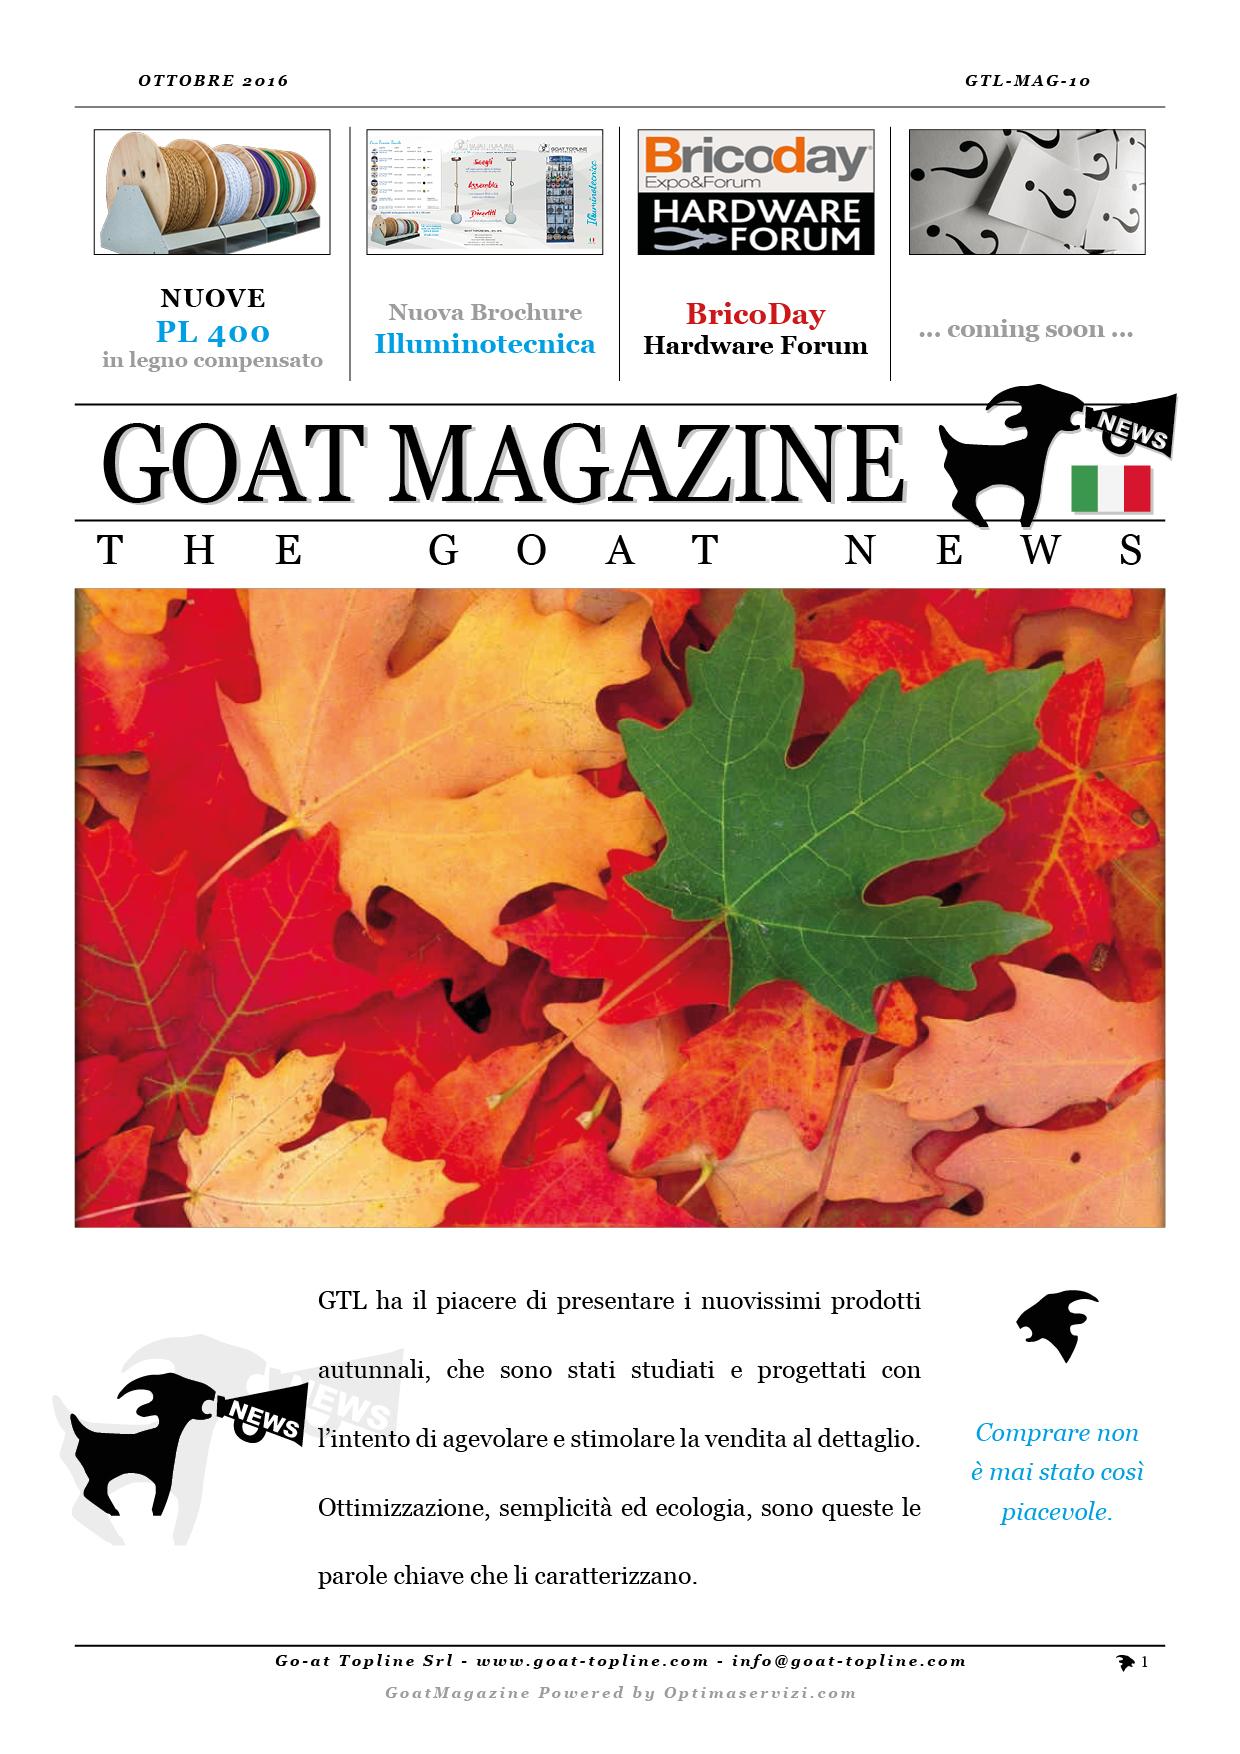 gtl-mag10-pubblico-ottobre-2016-ita